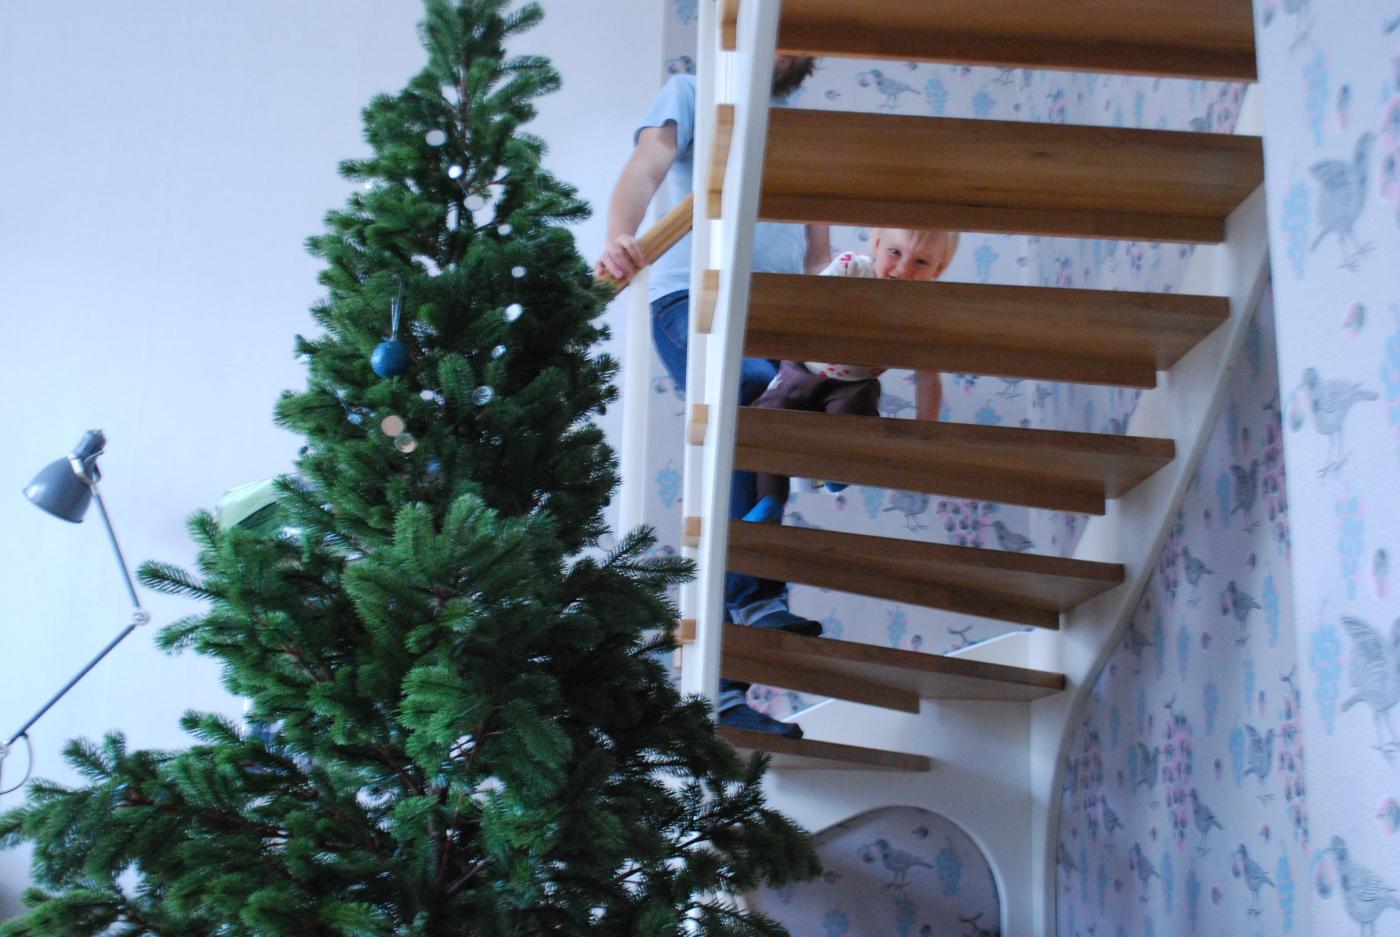 Vekkula julistaa joulurauhan